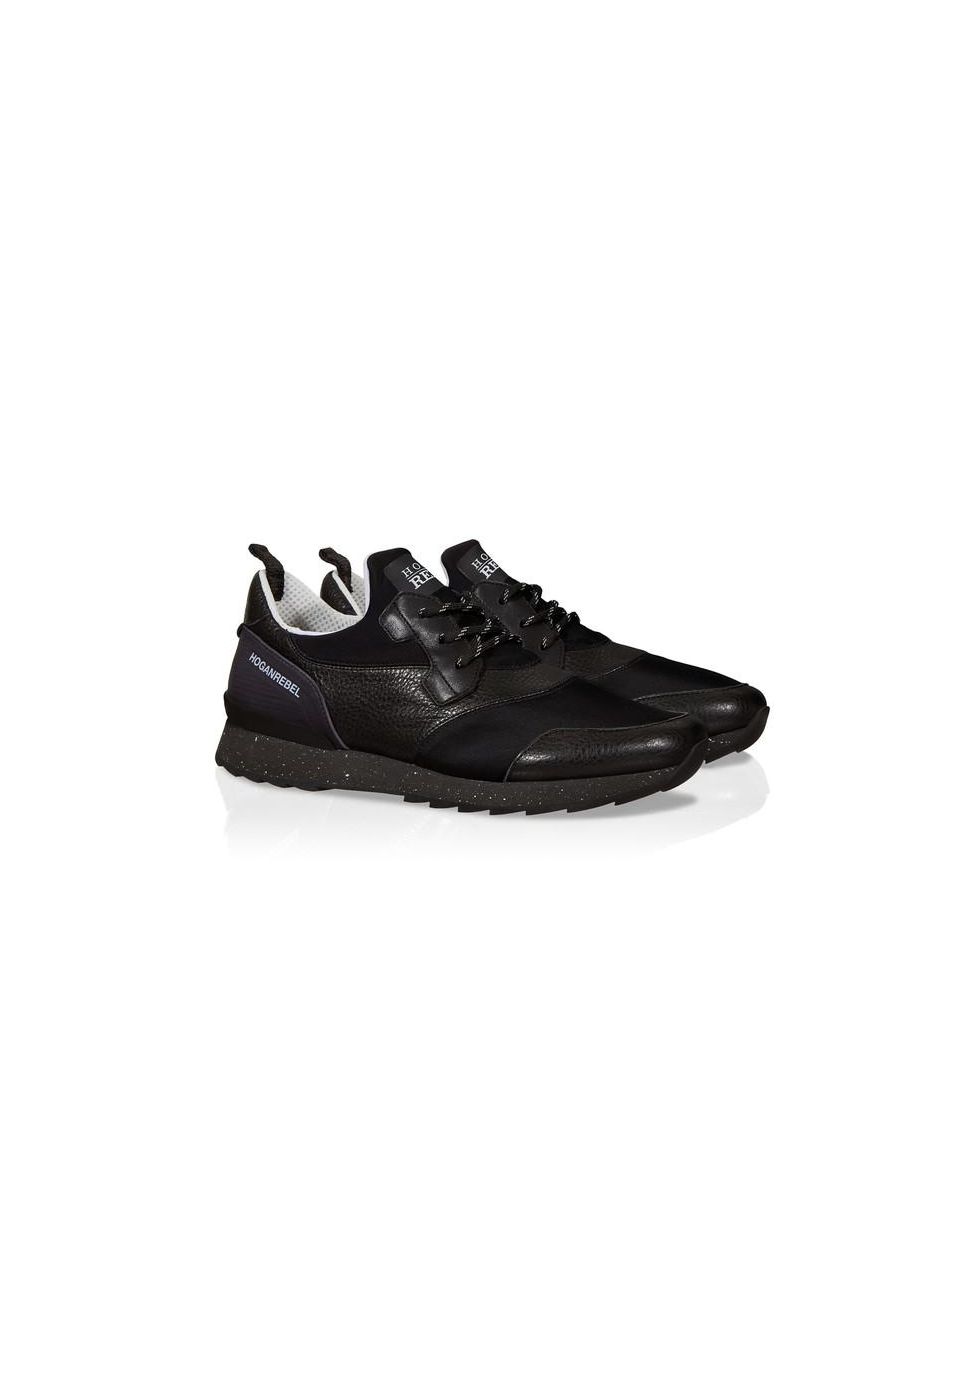 baskets hogan sneakers homme en cuir et tissu noir italian boutique. Black Bedroom Furniture Sets. Home Design Ideas